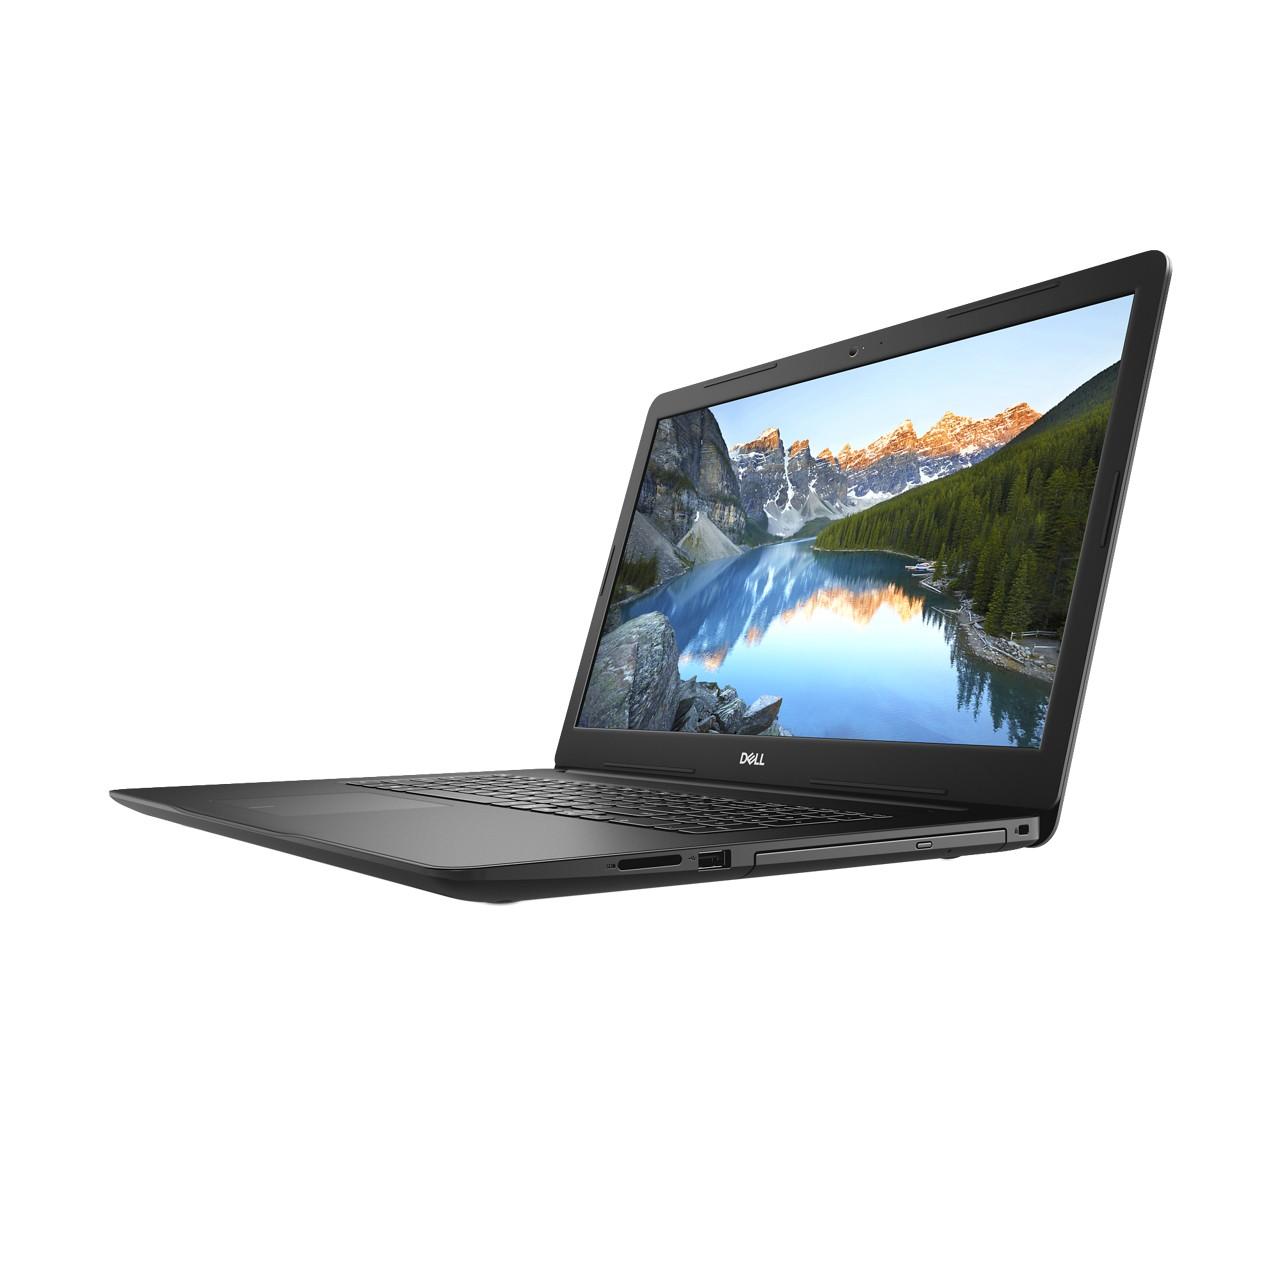 Dell Inspiron 17 3780 Laptop 17 3